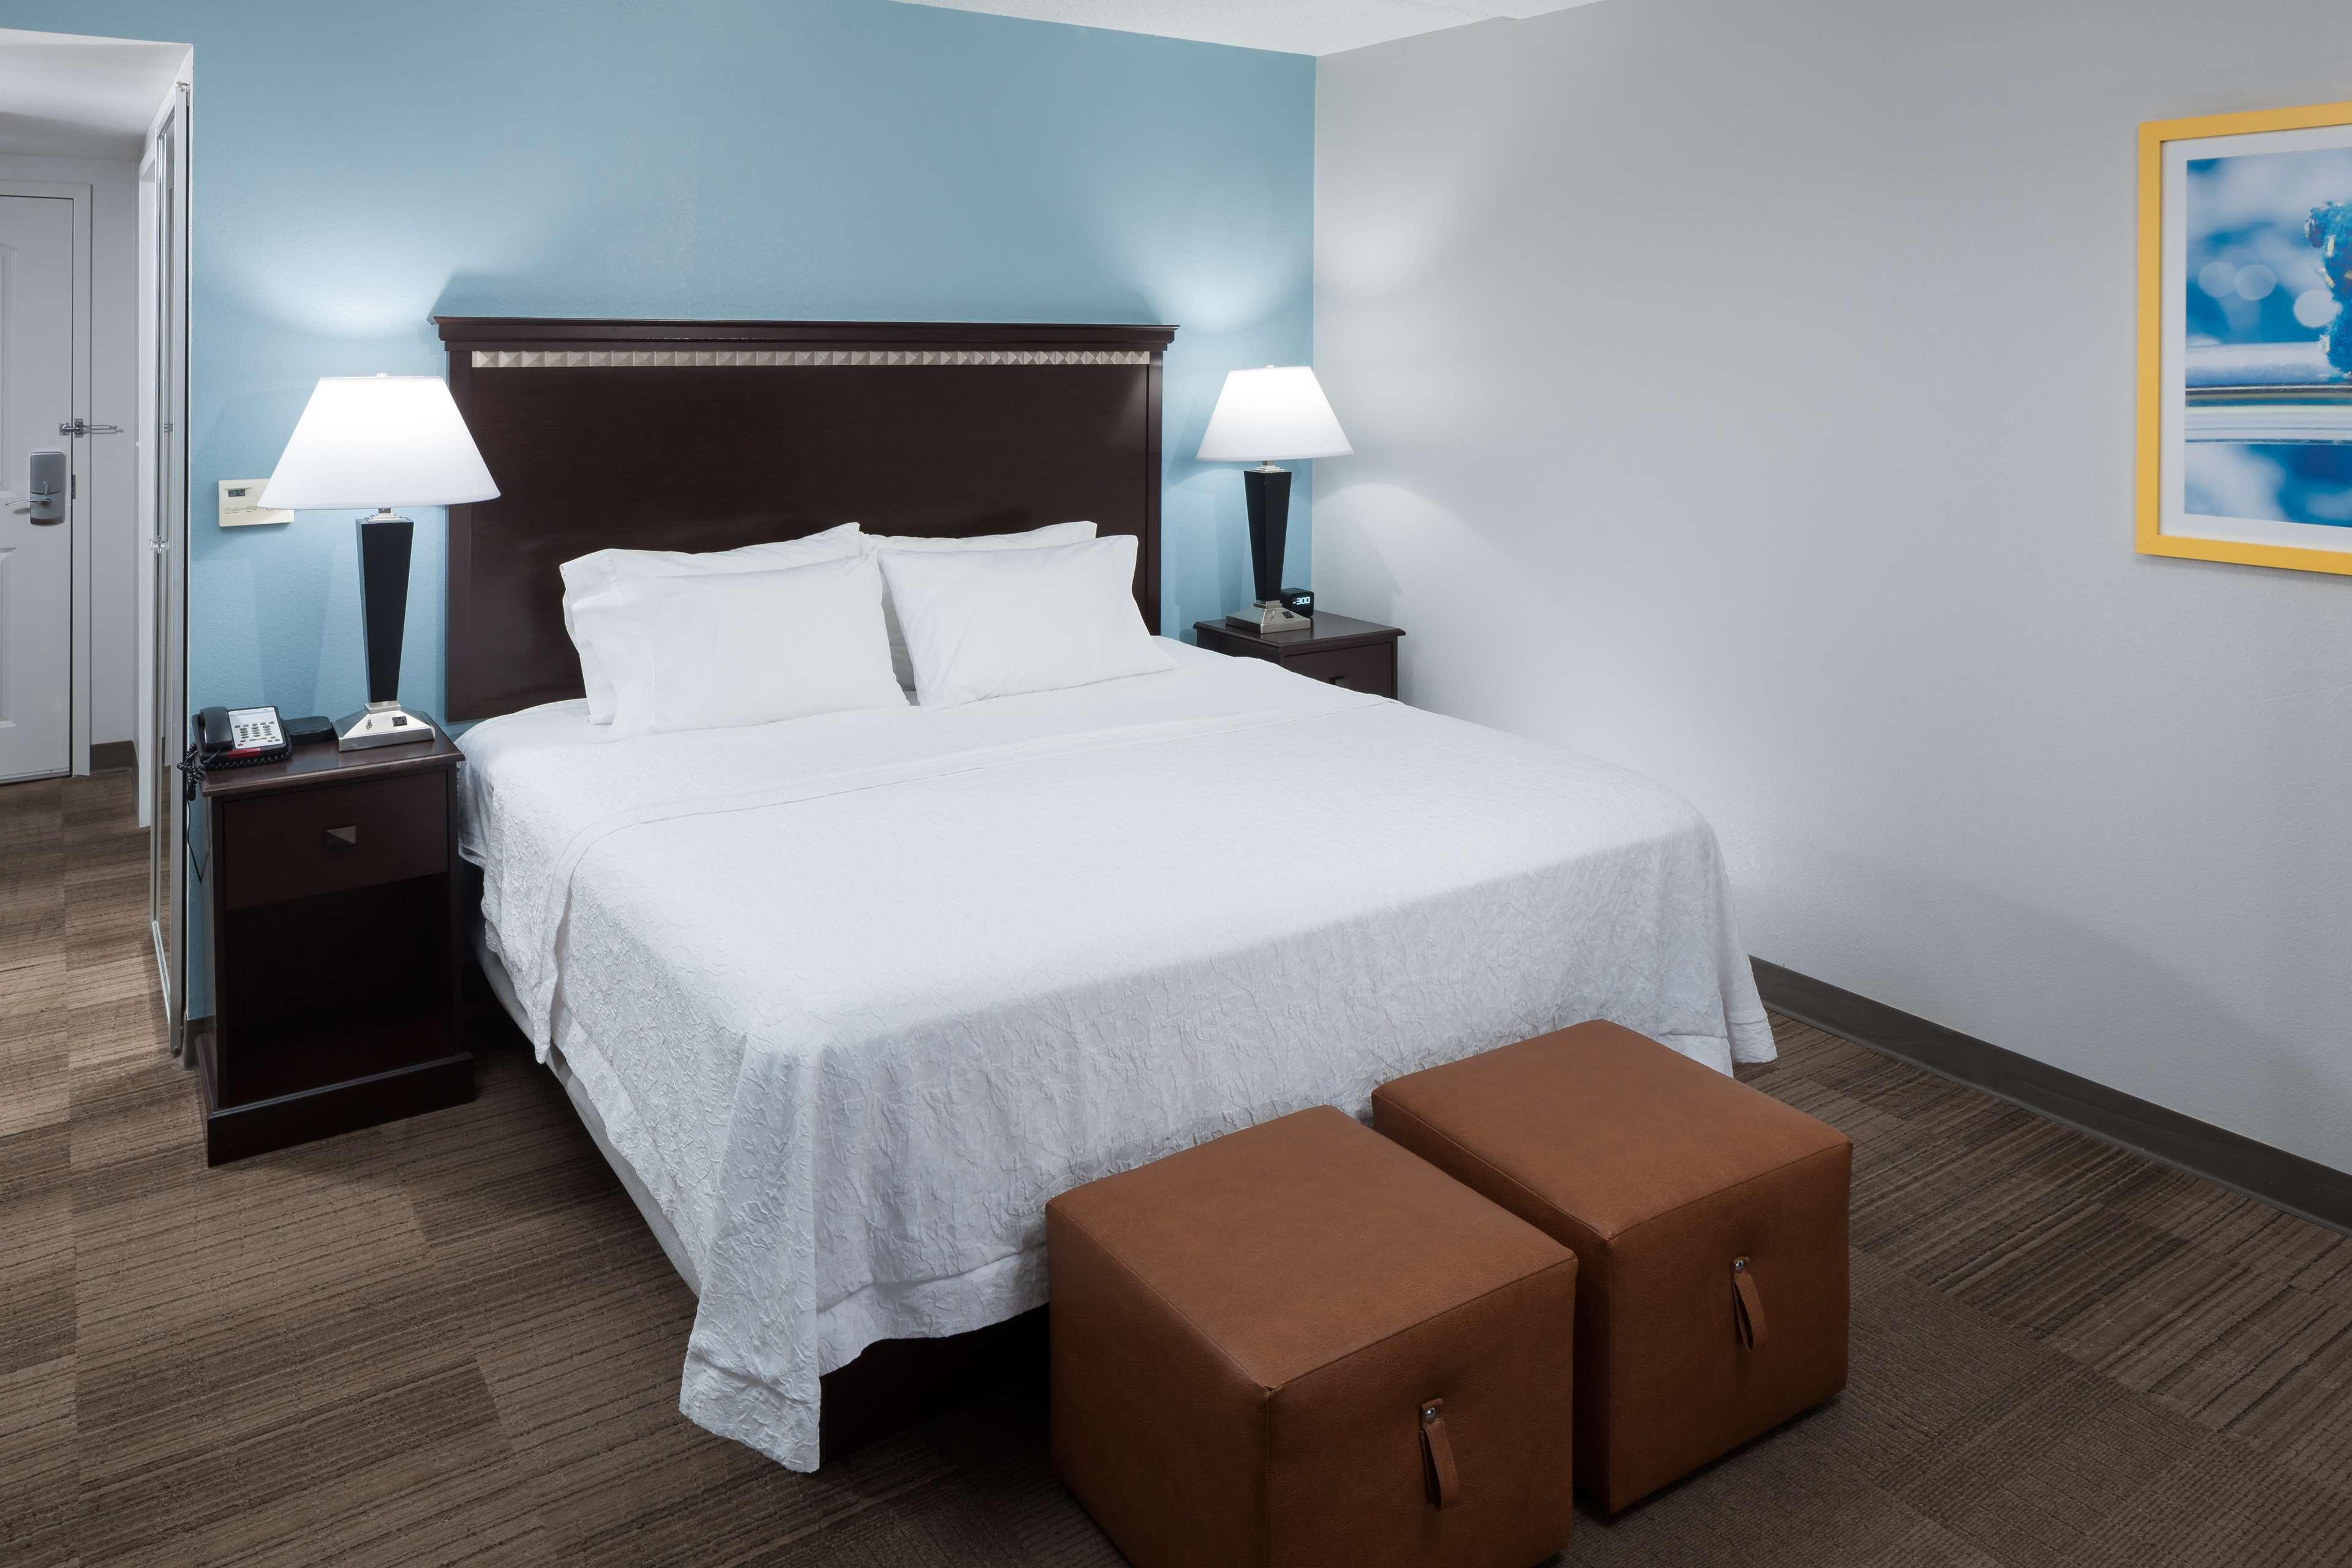 Hampton Inn & Suites Panama City Beach-Pier Park Area image 26